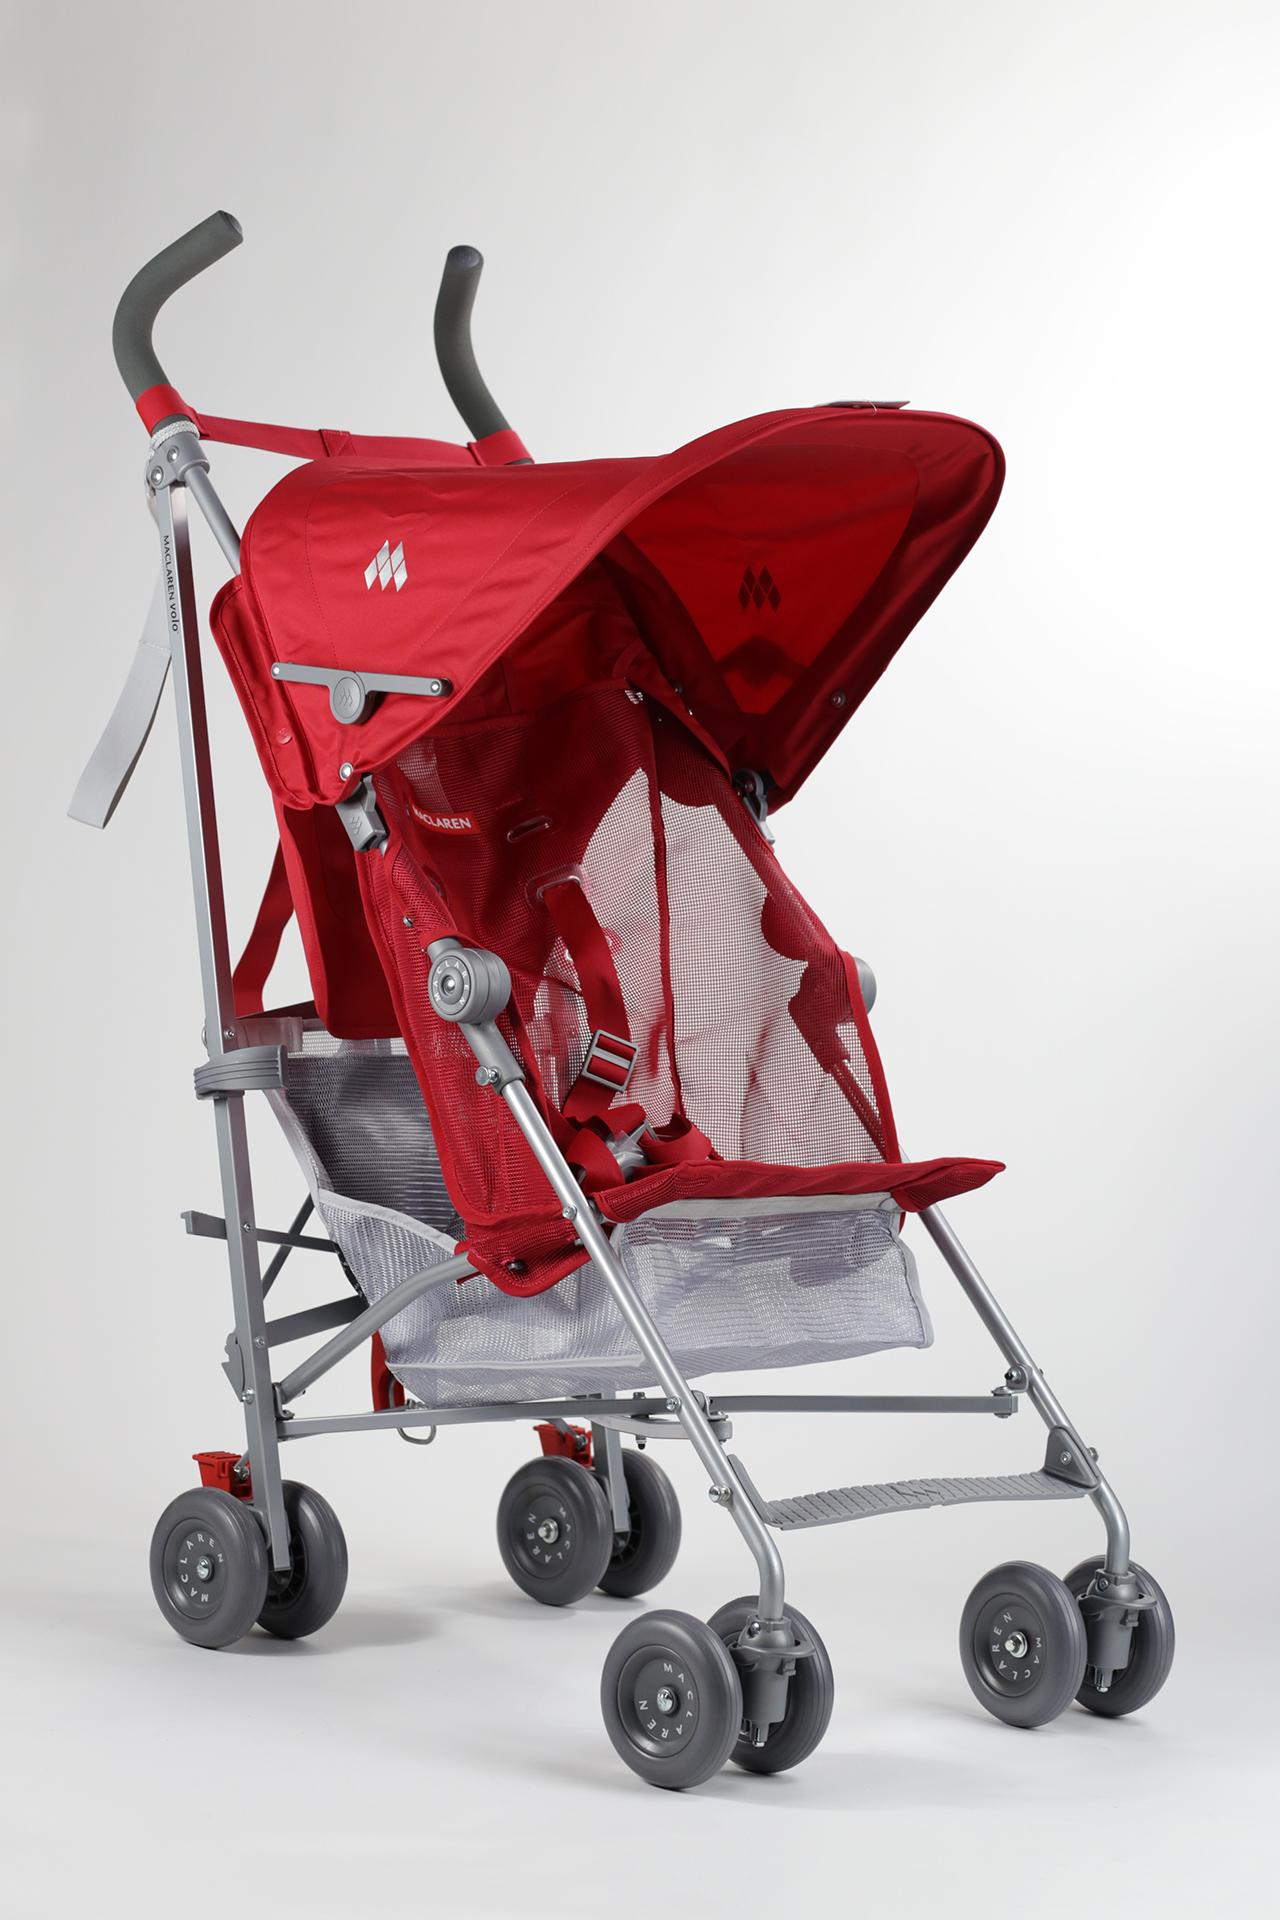 silla de paseo volo maclaren 2015 scarlet comprar en